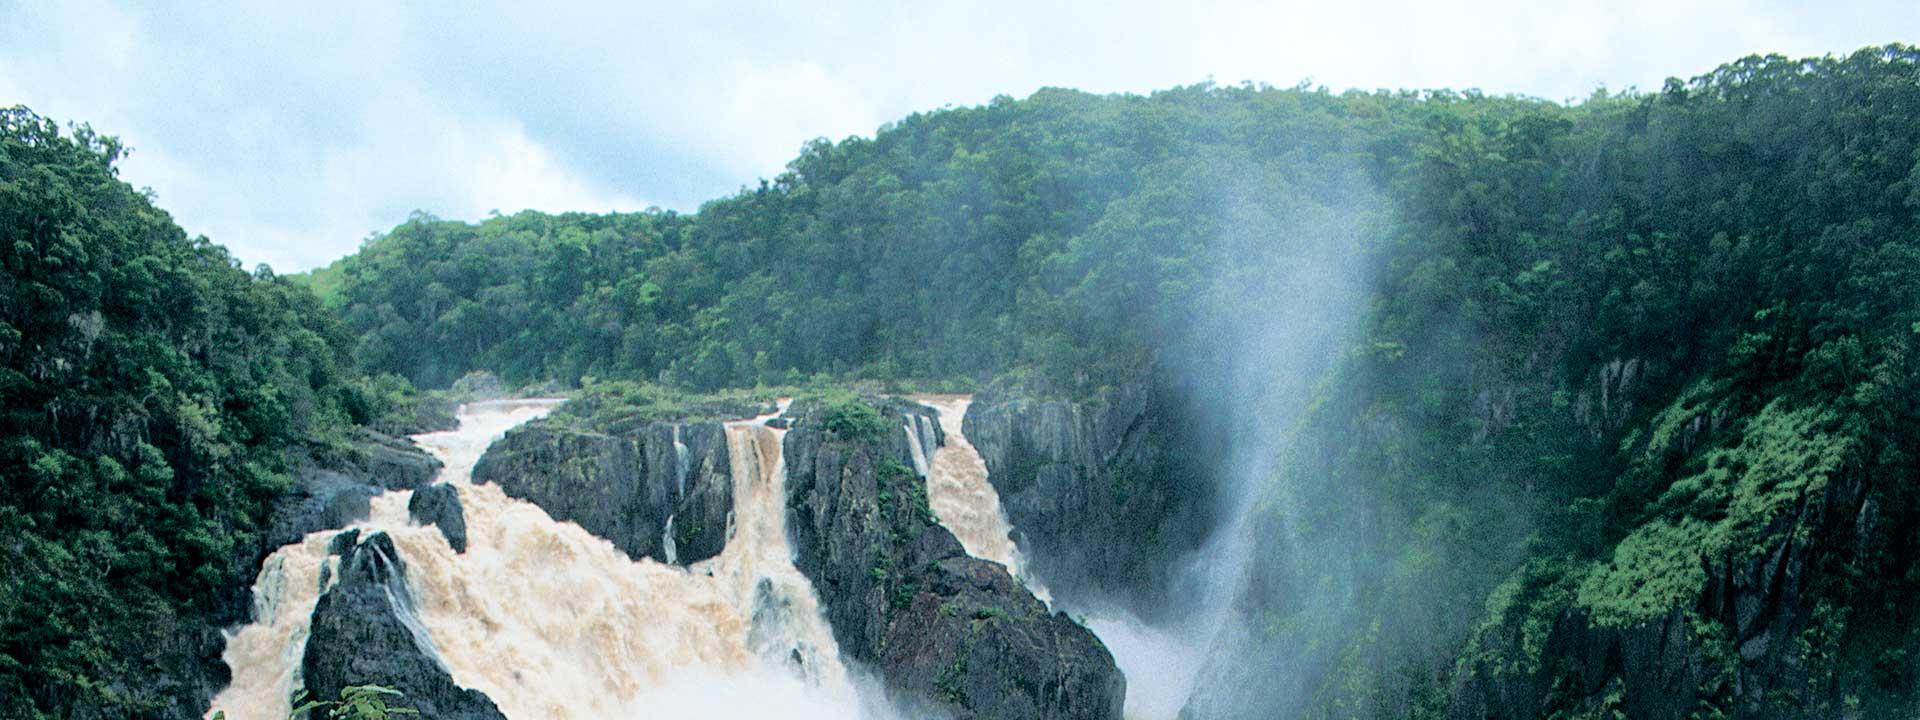 Discover the immense beauty of Barron Falls in Kuranda